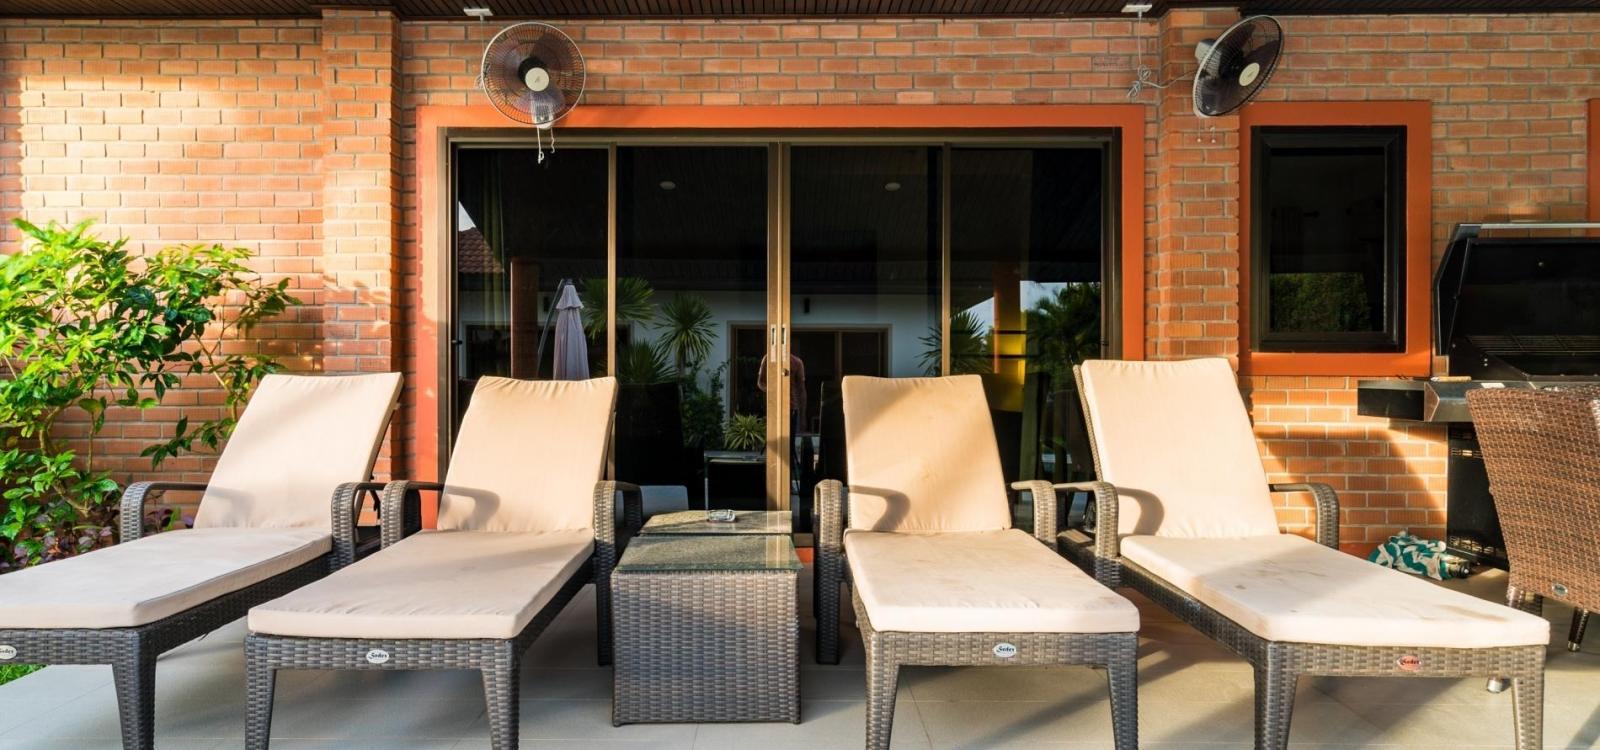 Pasak soi 3 - Convenient pool villa in quiet location, near Laguna, Boat avenue